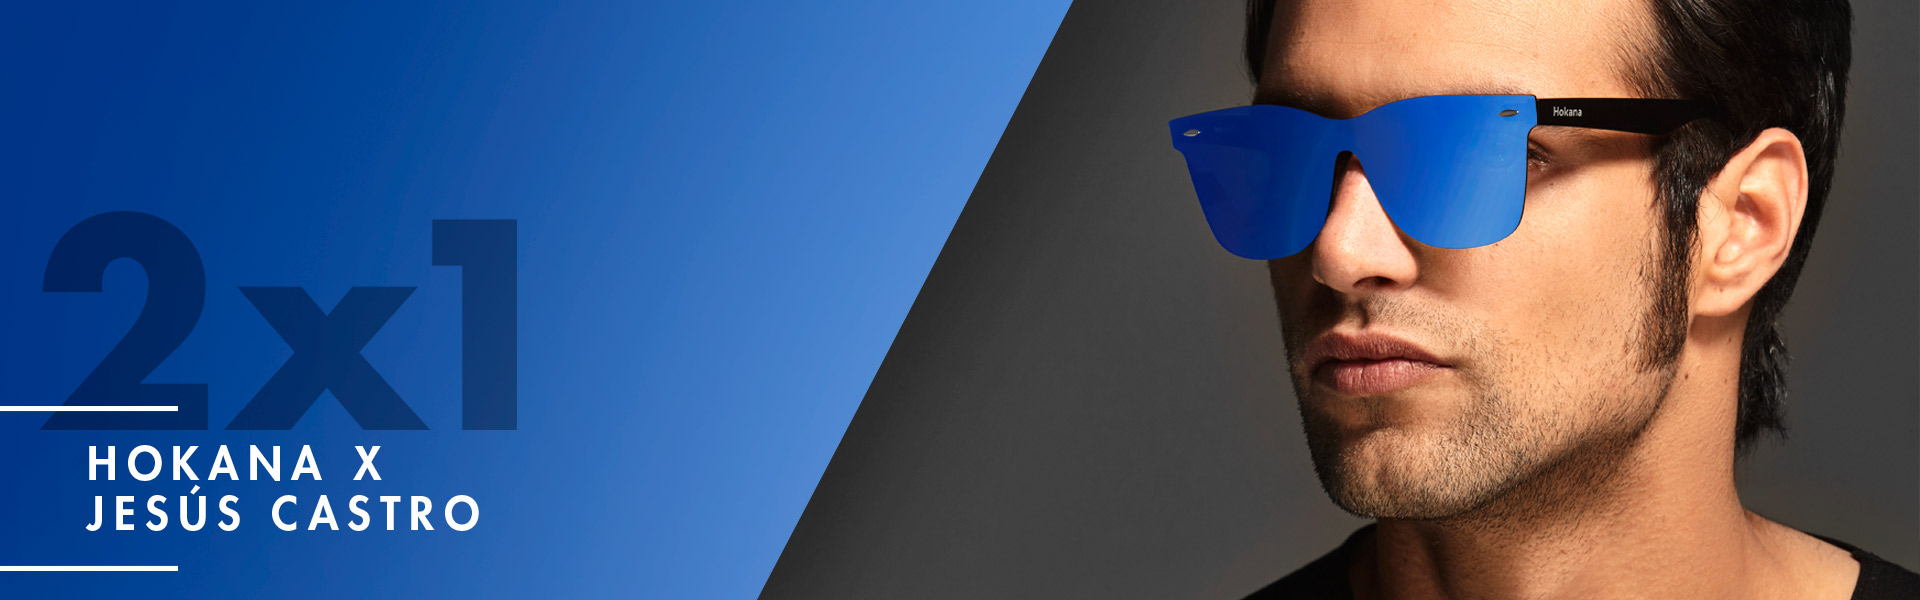 Hokana Sunglasses Promo 2x1